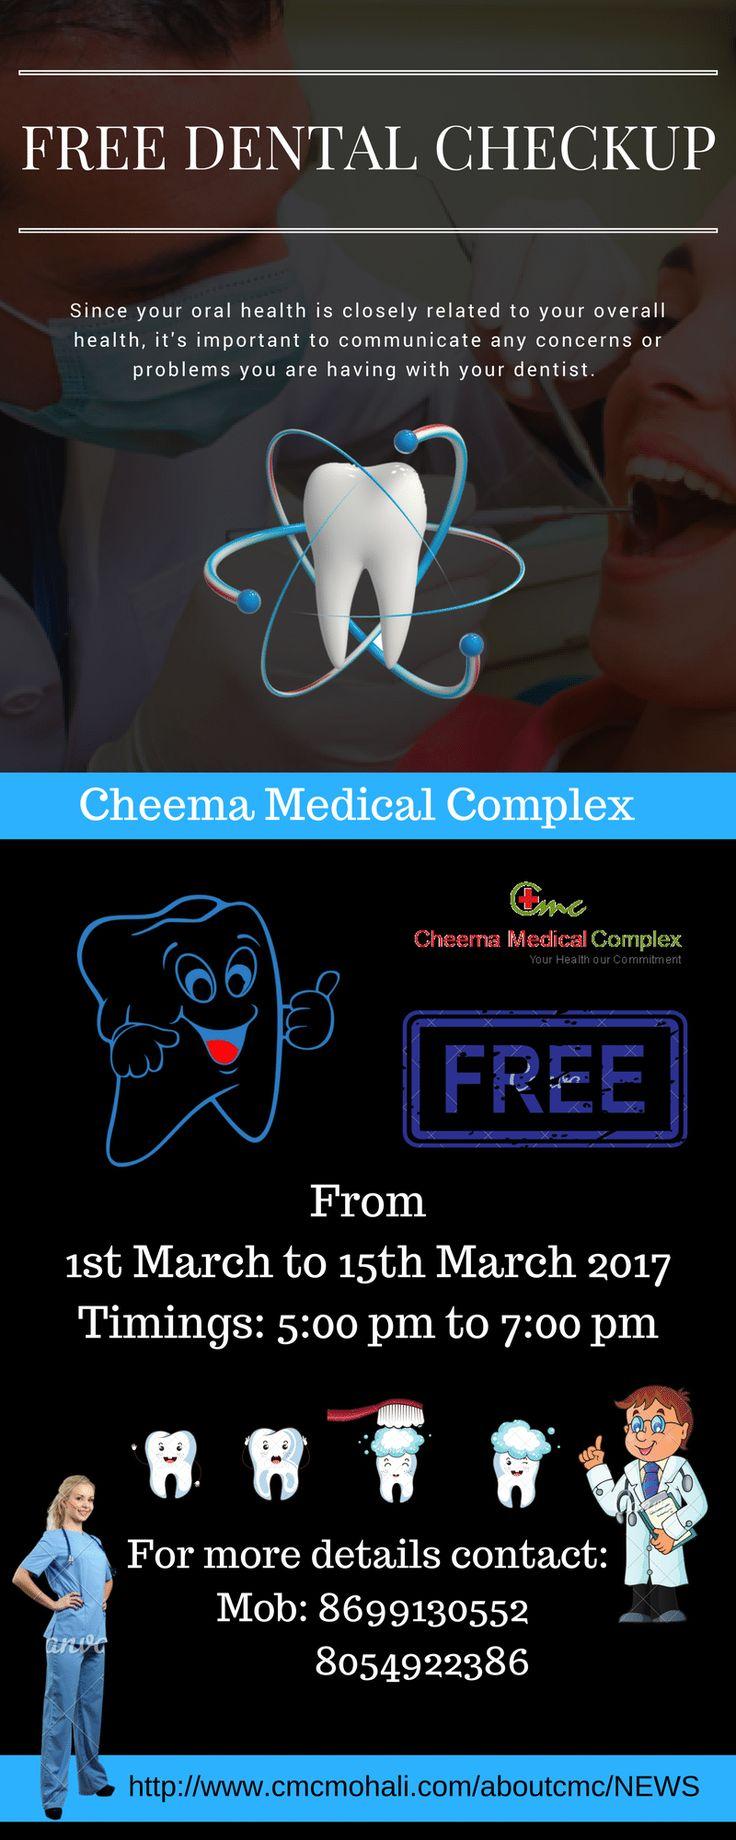 Best Offer #CMCMohali - Free #Dental #CheckUp